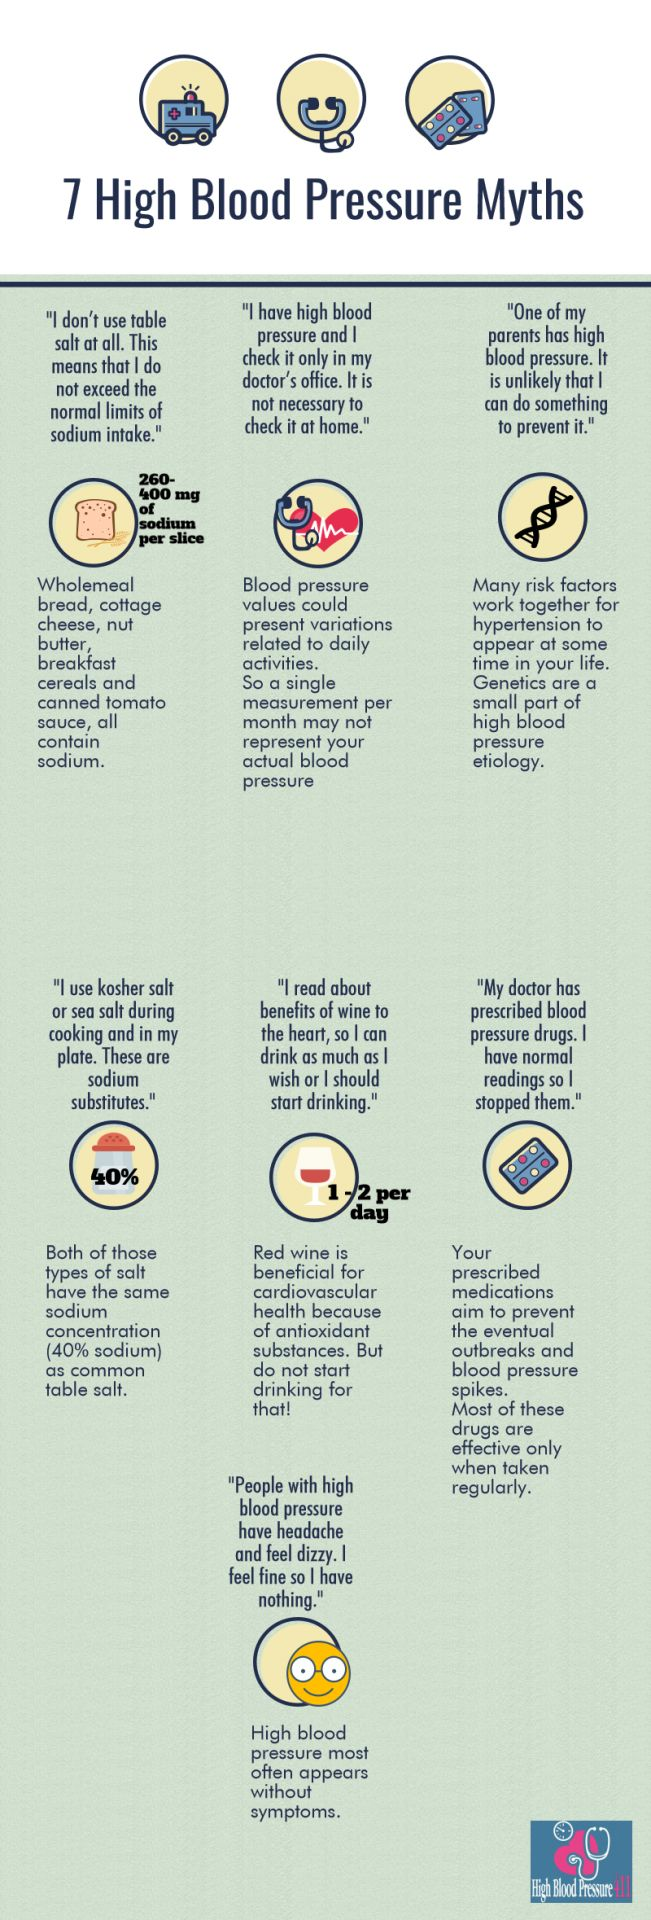 High Blood Pressure Myths